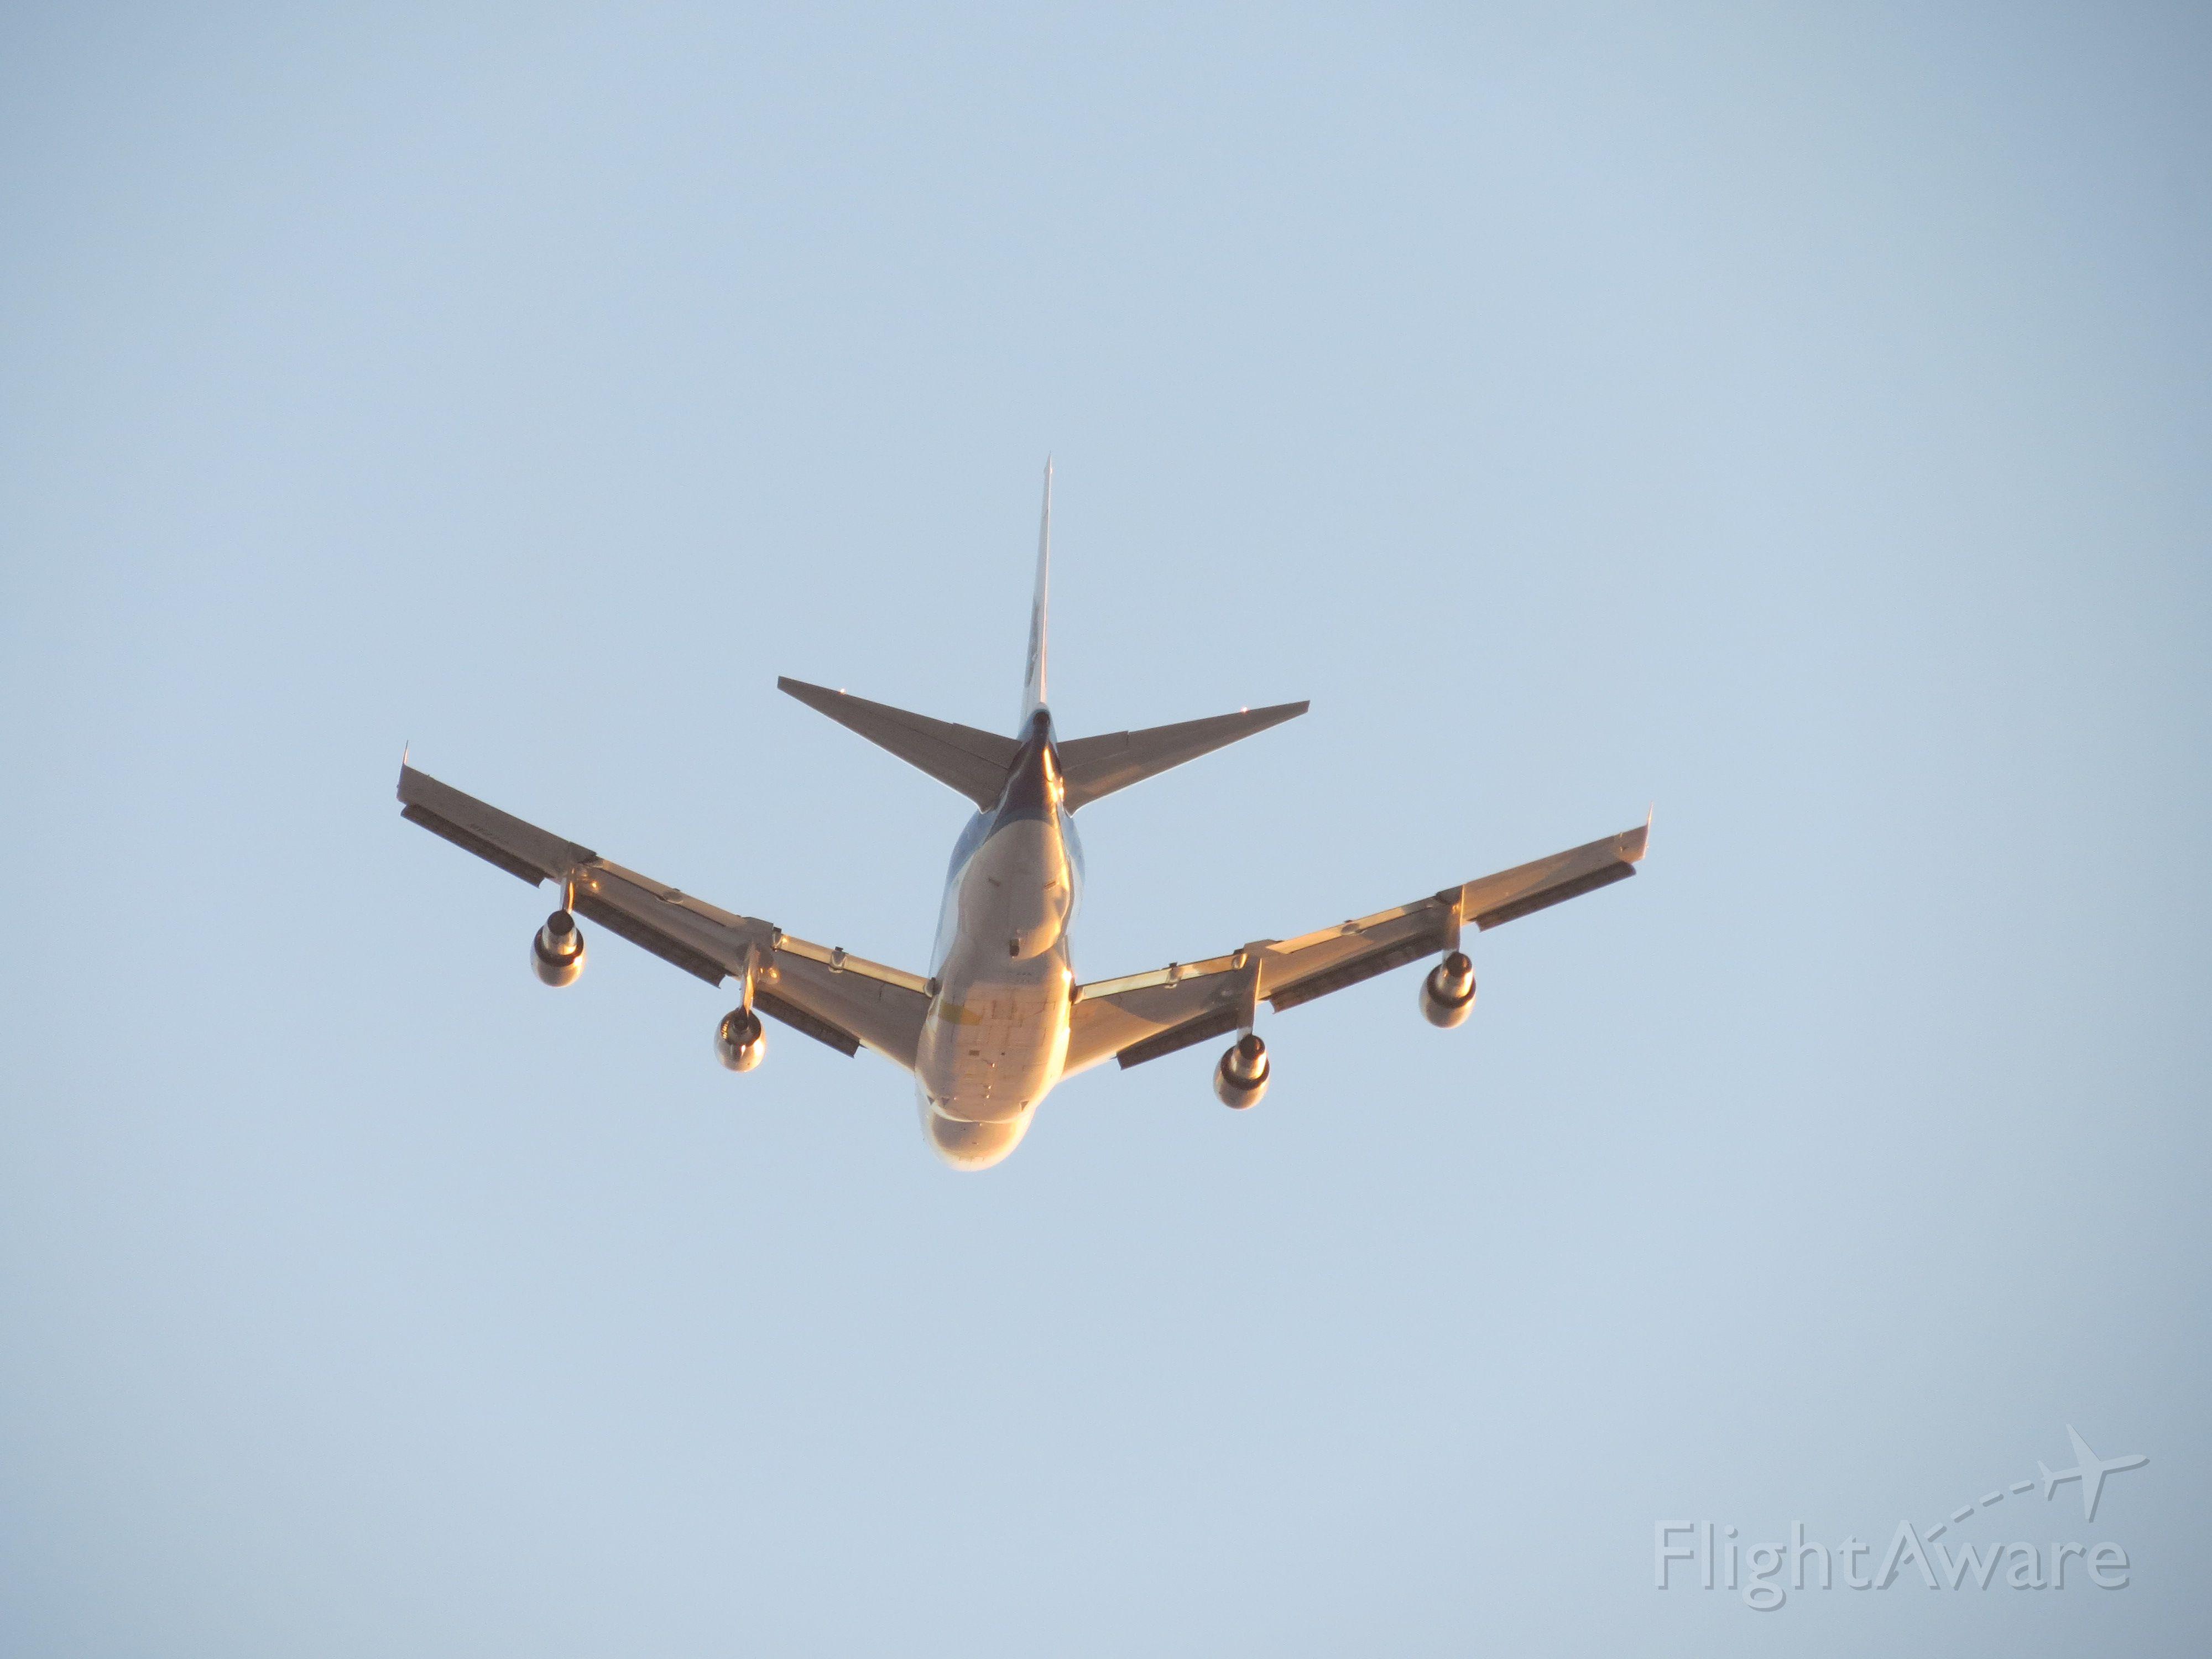 BOEING 747SP (C-FPAW) - Pratt & Whitney Canada New engine Test flight